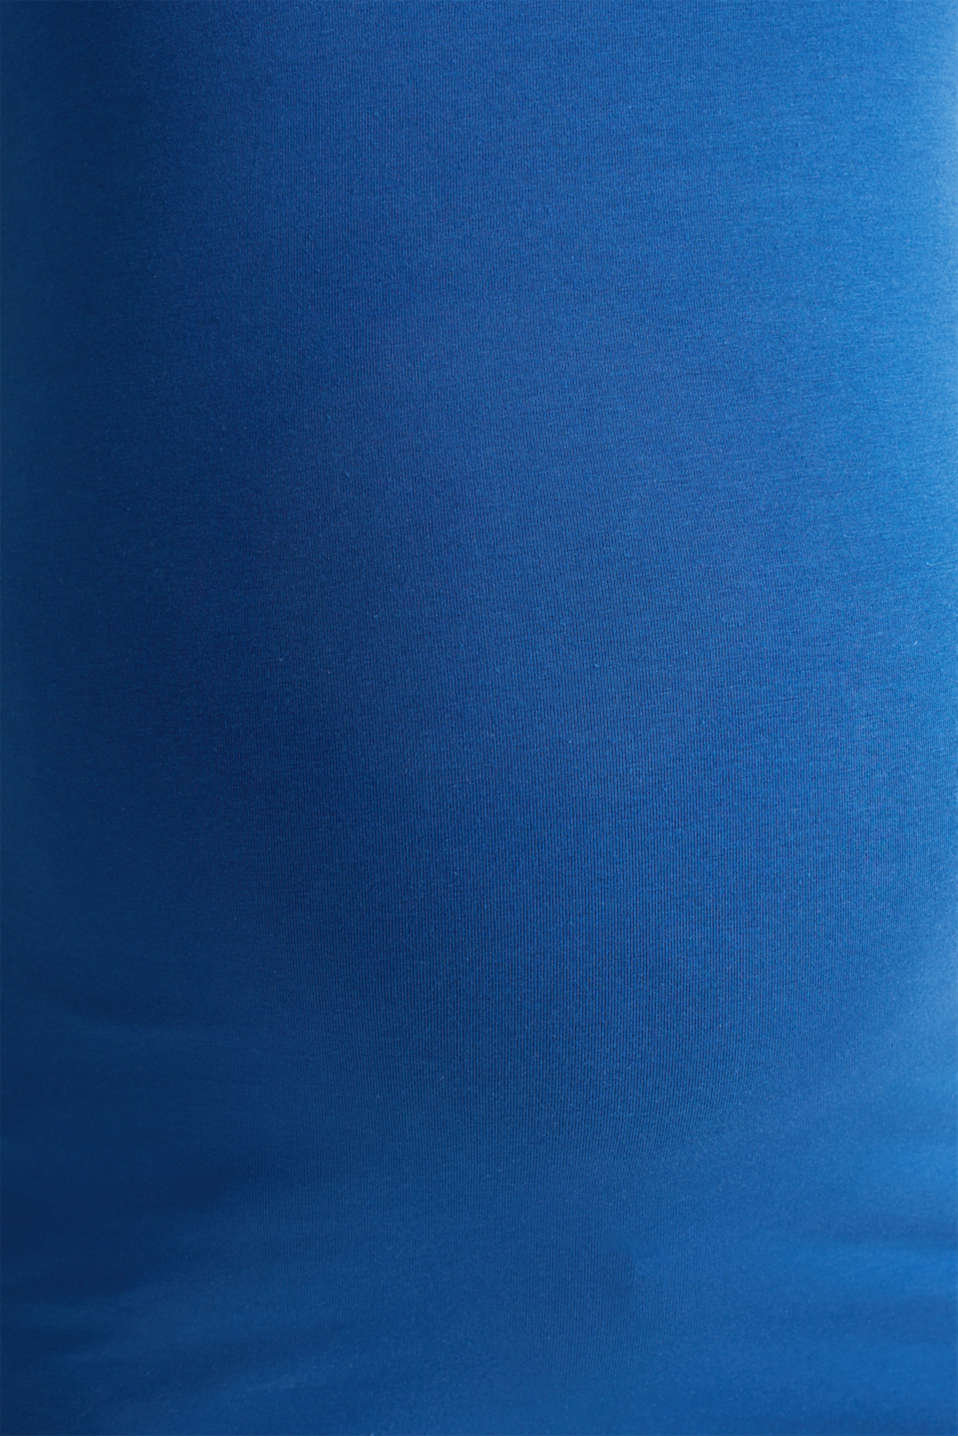 Stretchy nursing top, LCBRIGHT BLUE, detail image number 4